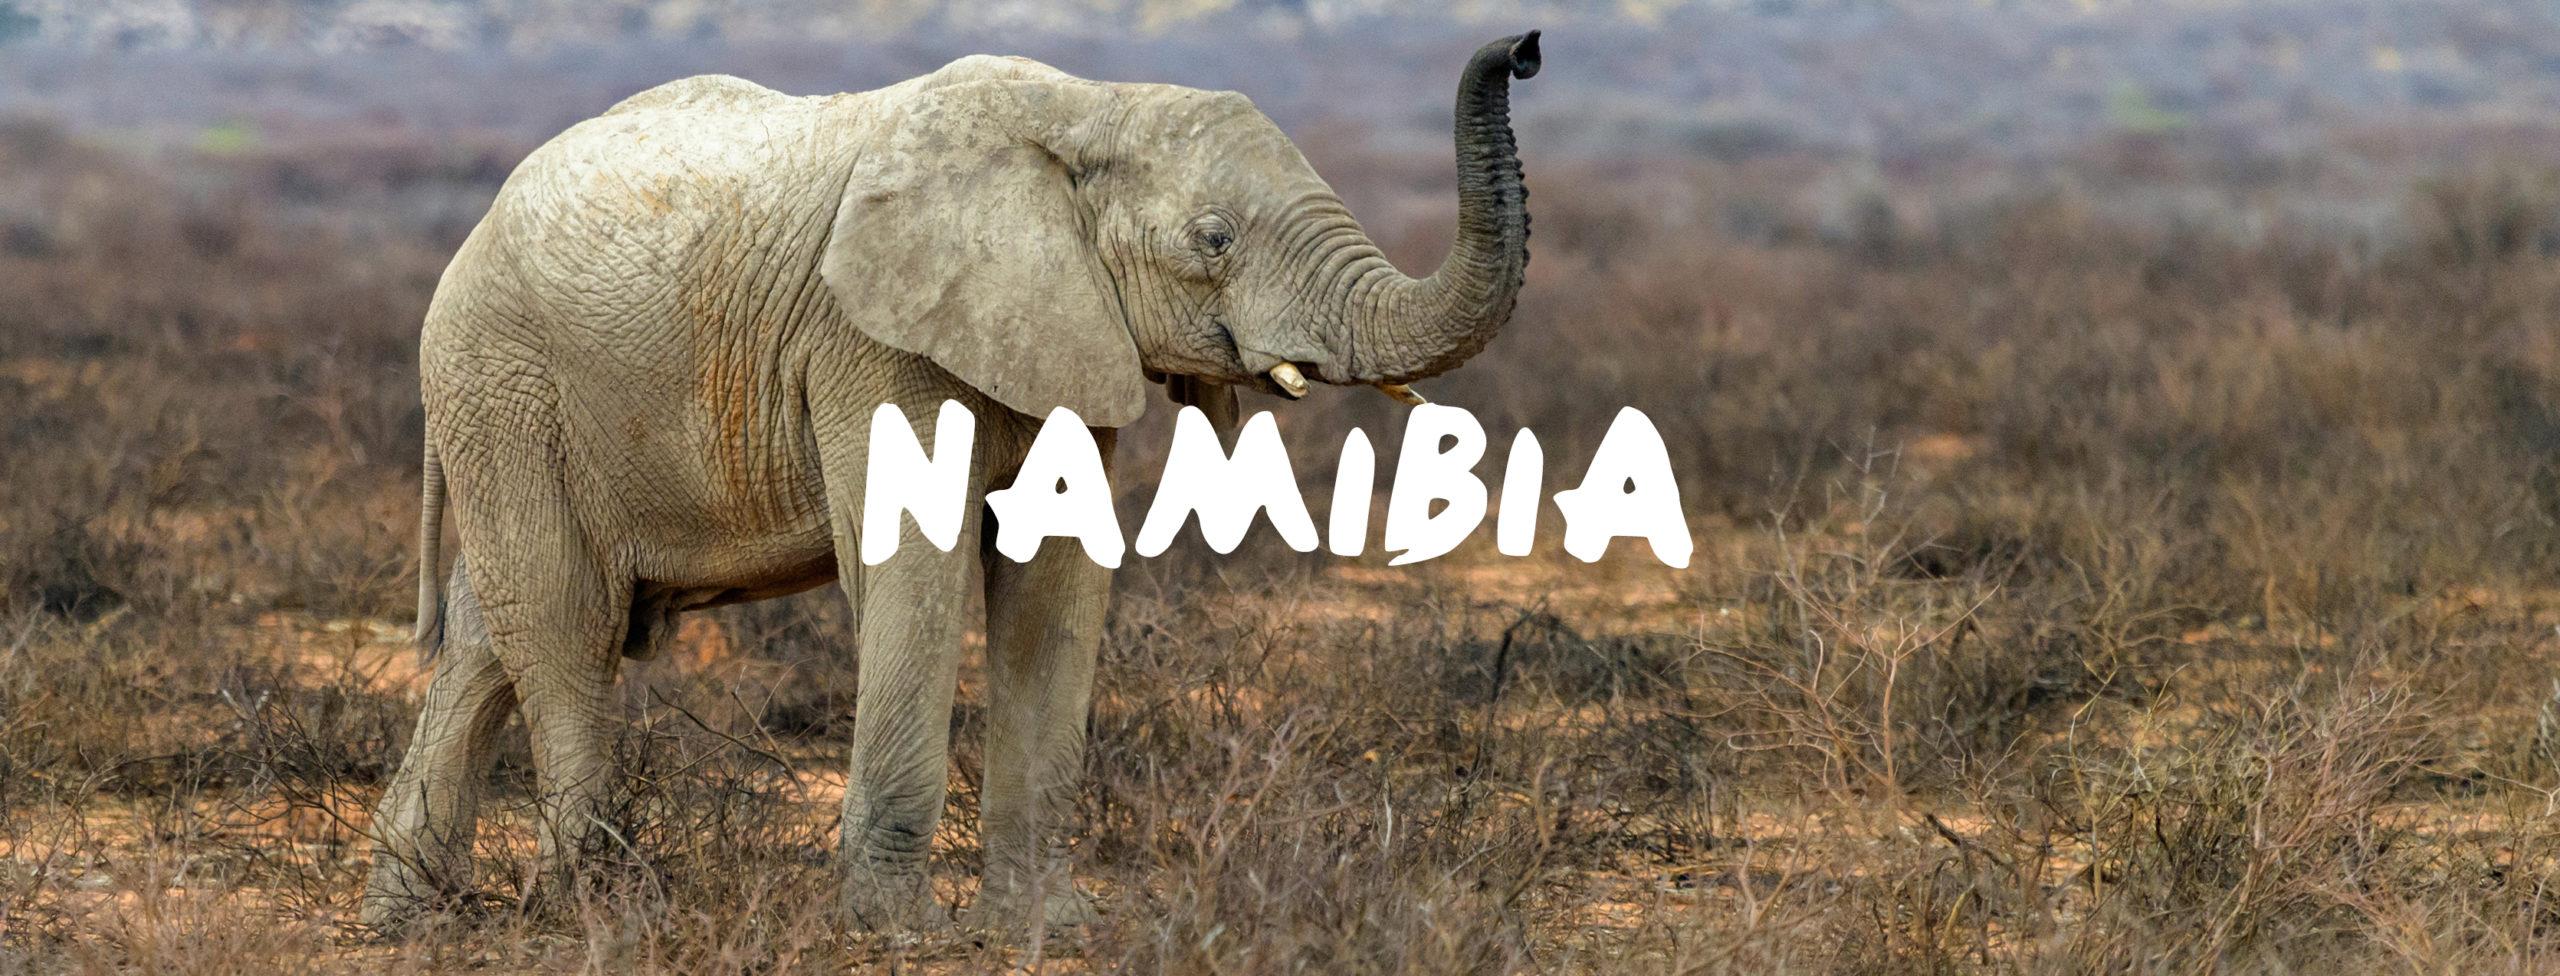 Namibia Urlaub buchen im Reisebüro Rosenheim Wagner Reisen Raubling